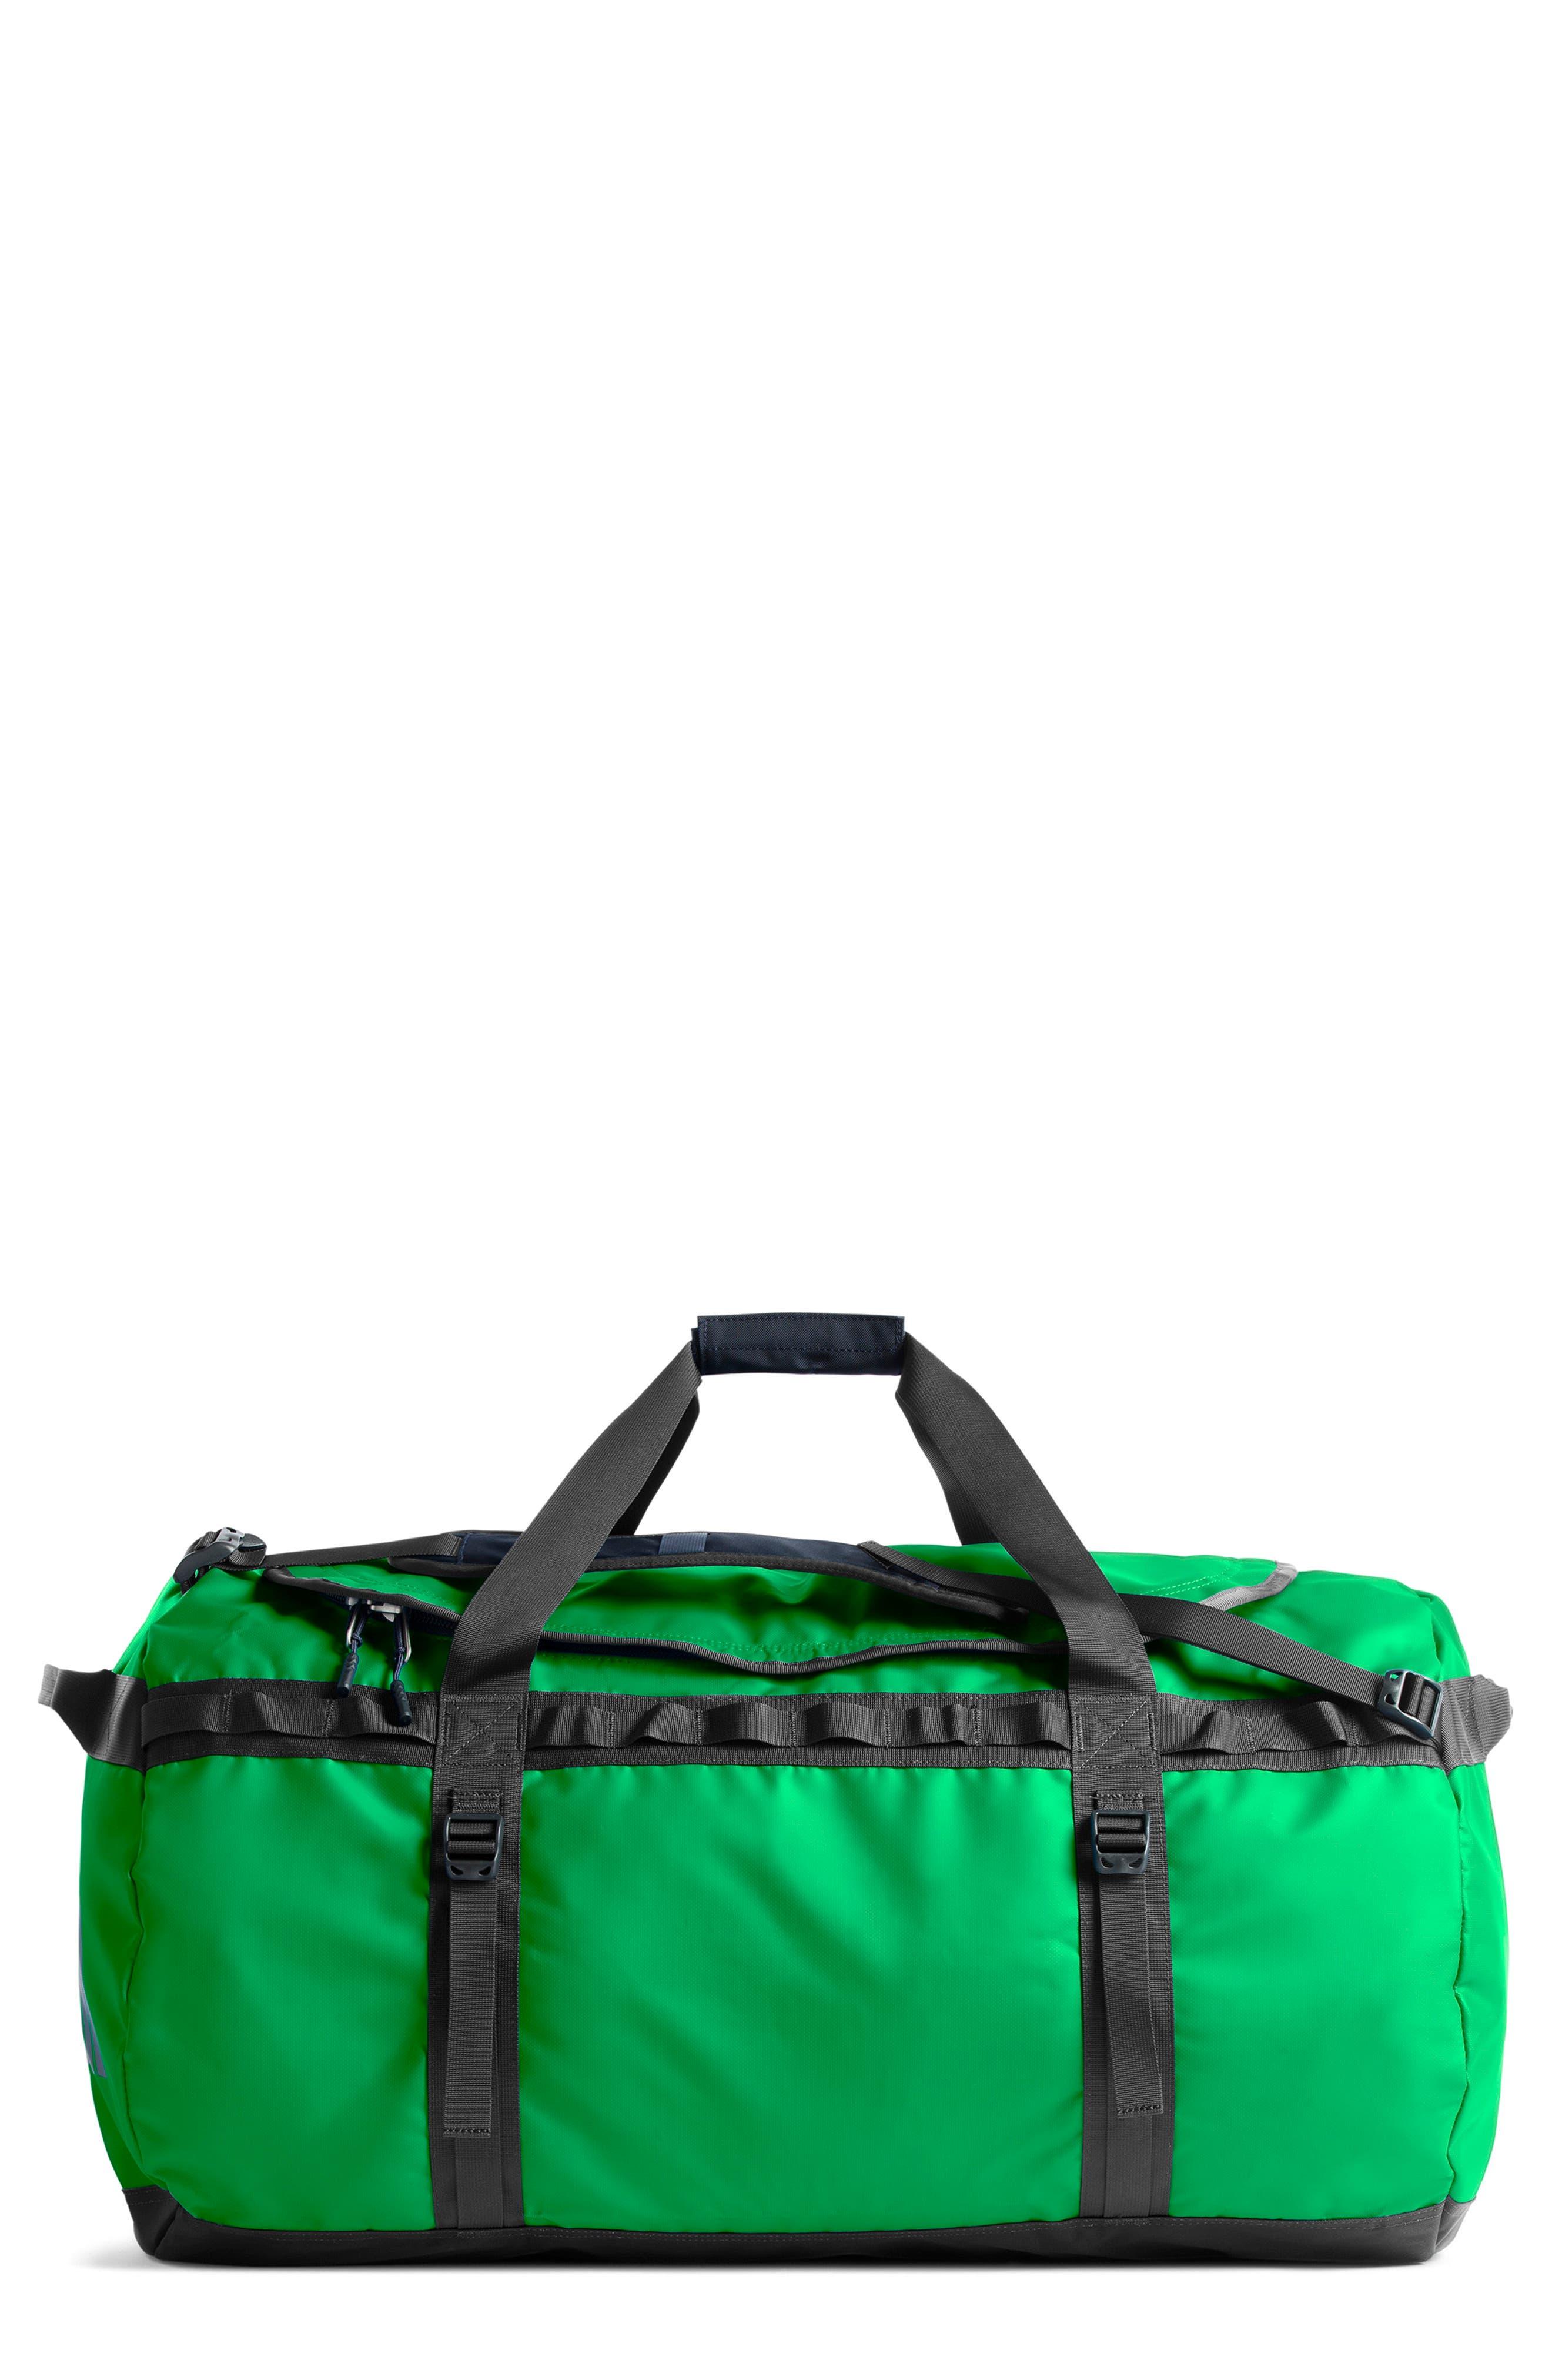 Base Camp XL Duffel Bag,                         Main,                         color, GREEN/ ASPHALT GREY